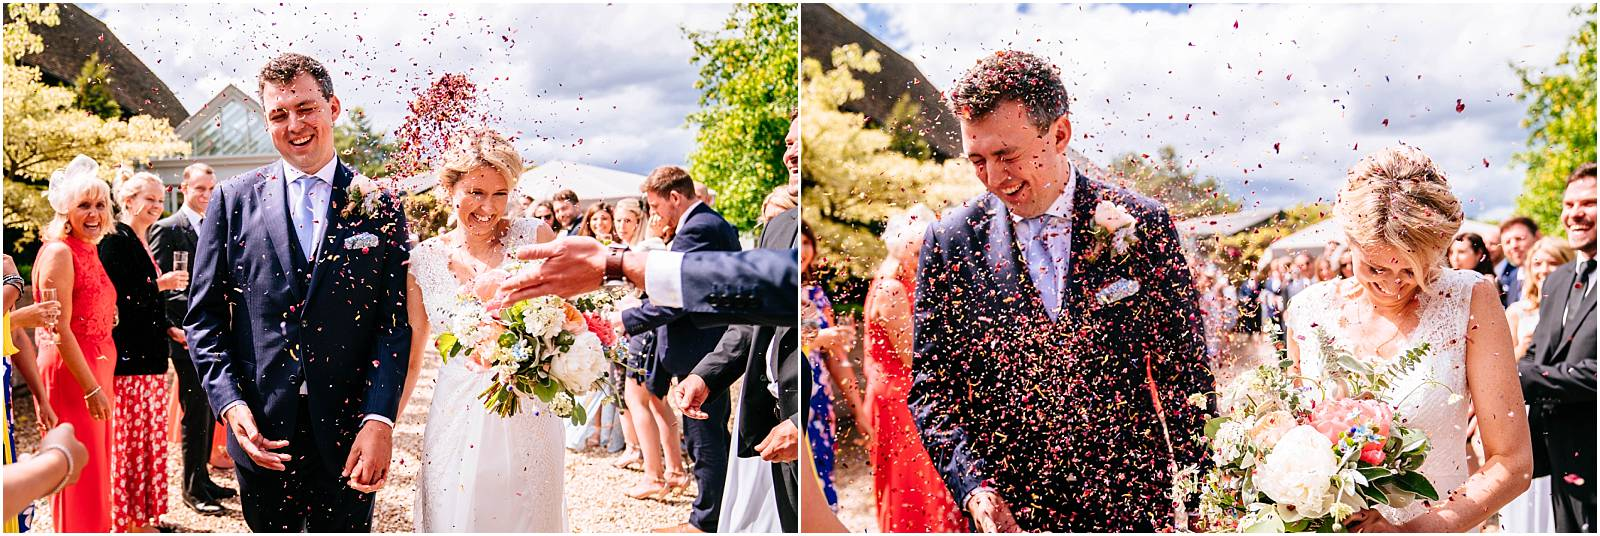 surrey wedding photographer confetti shot